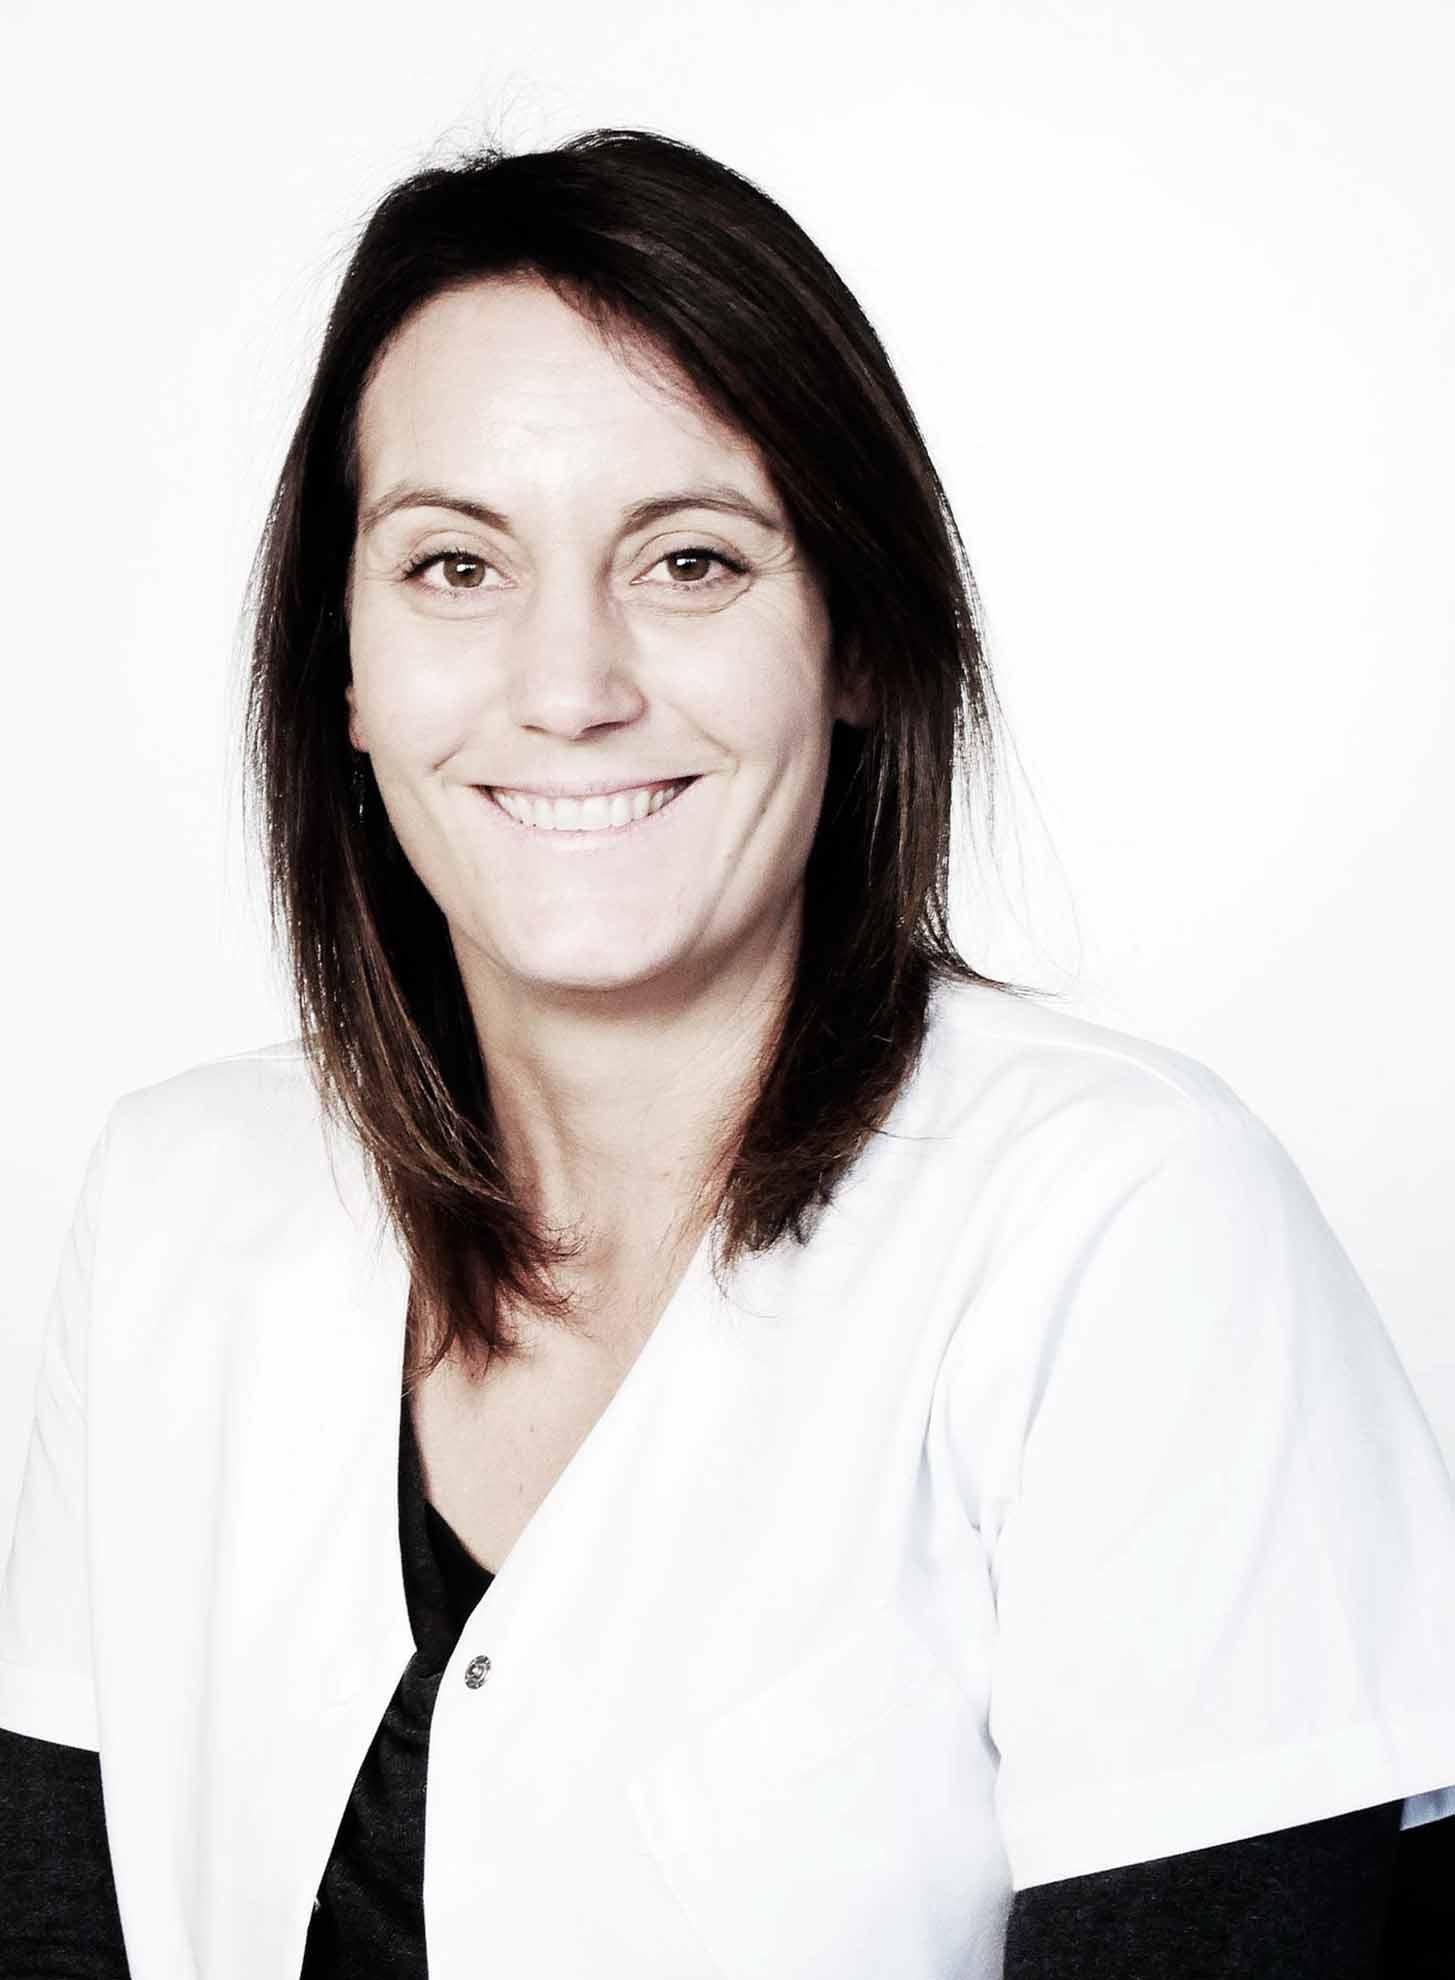 Emilie Colizzi